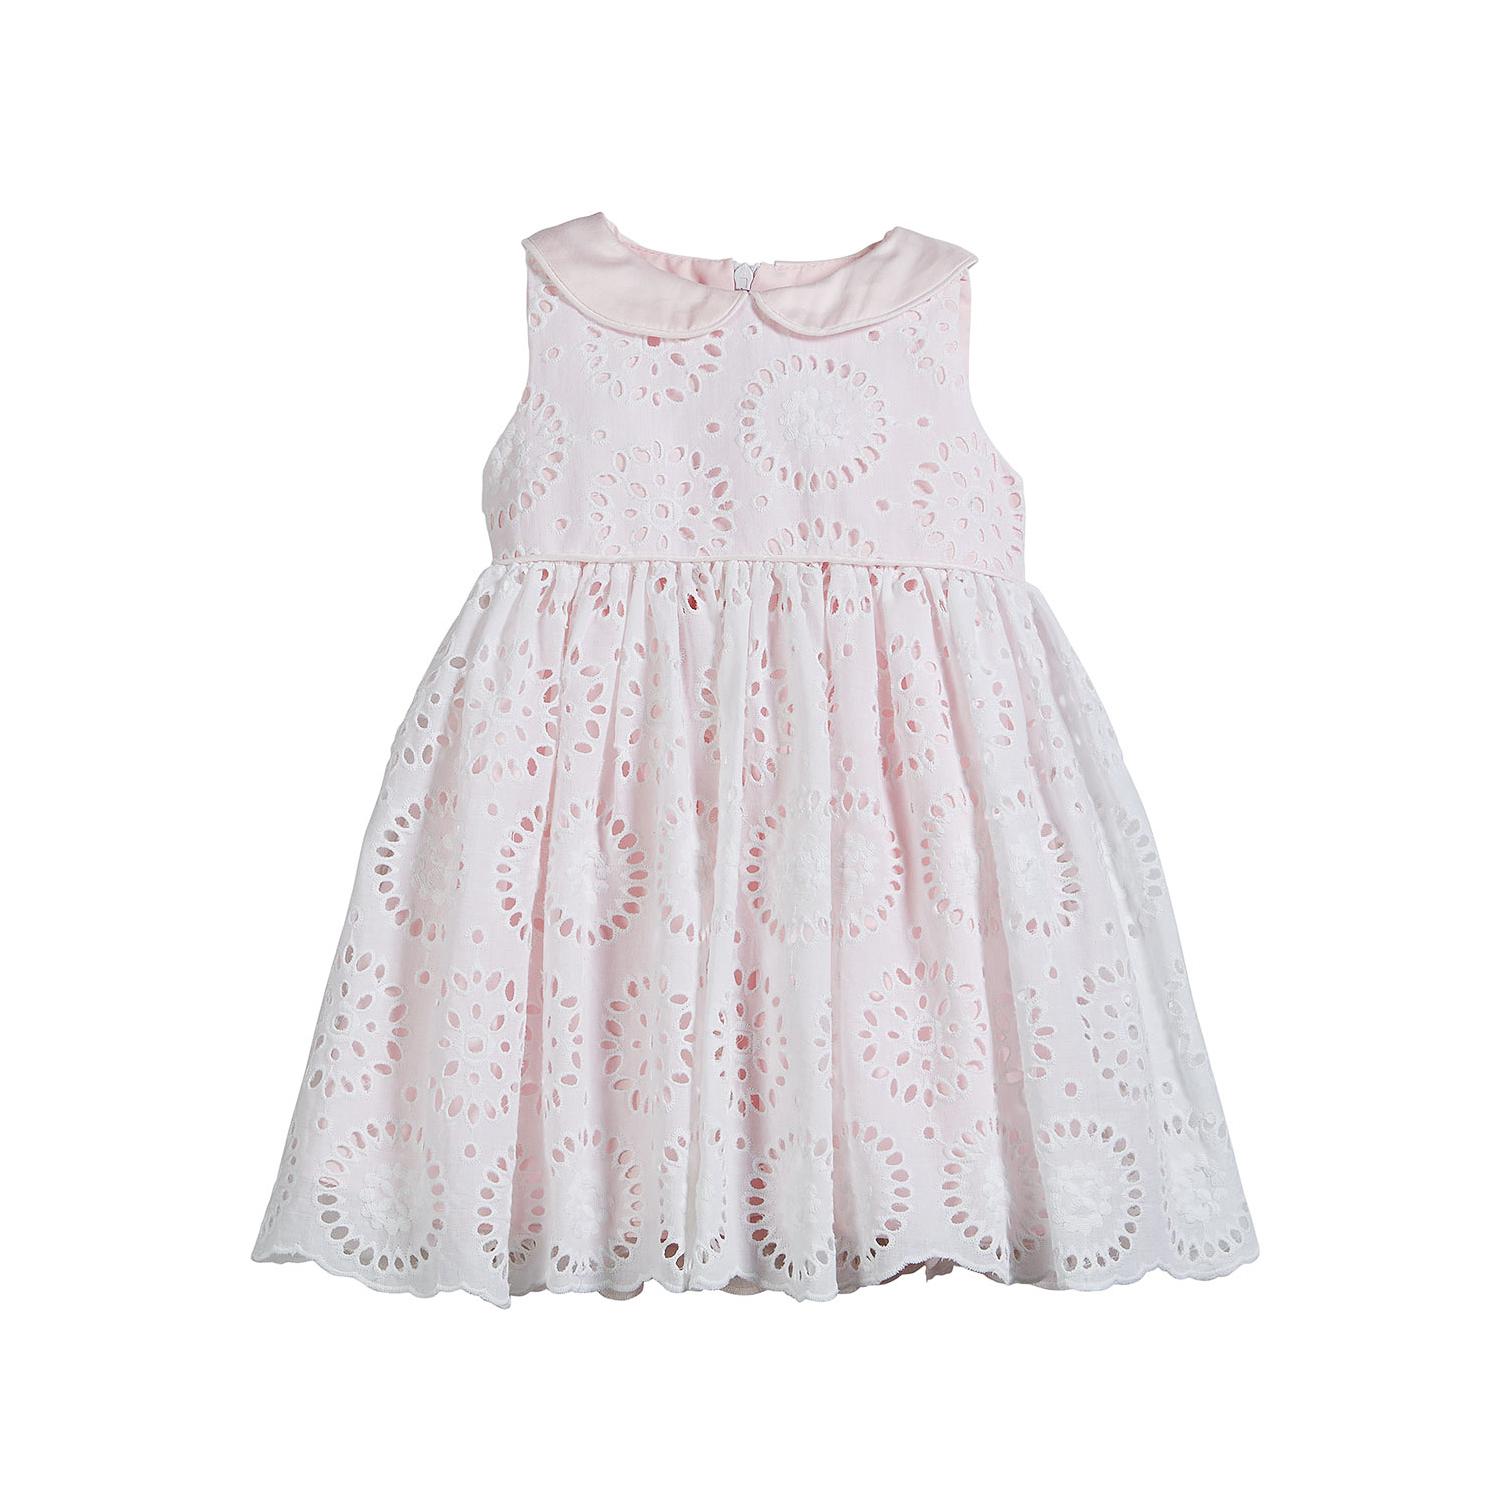 summer flower girl outfit eyelet pink dress